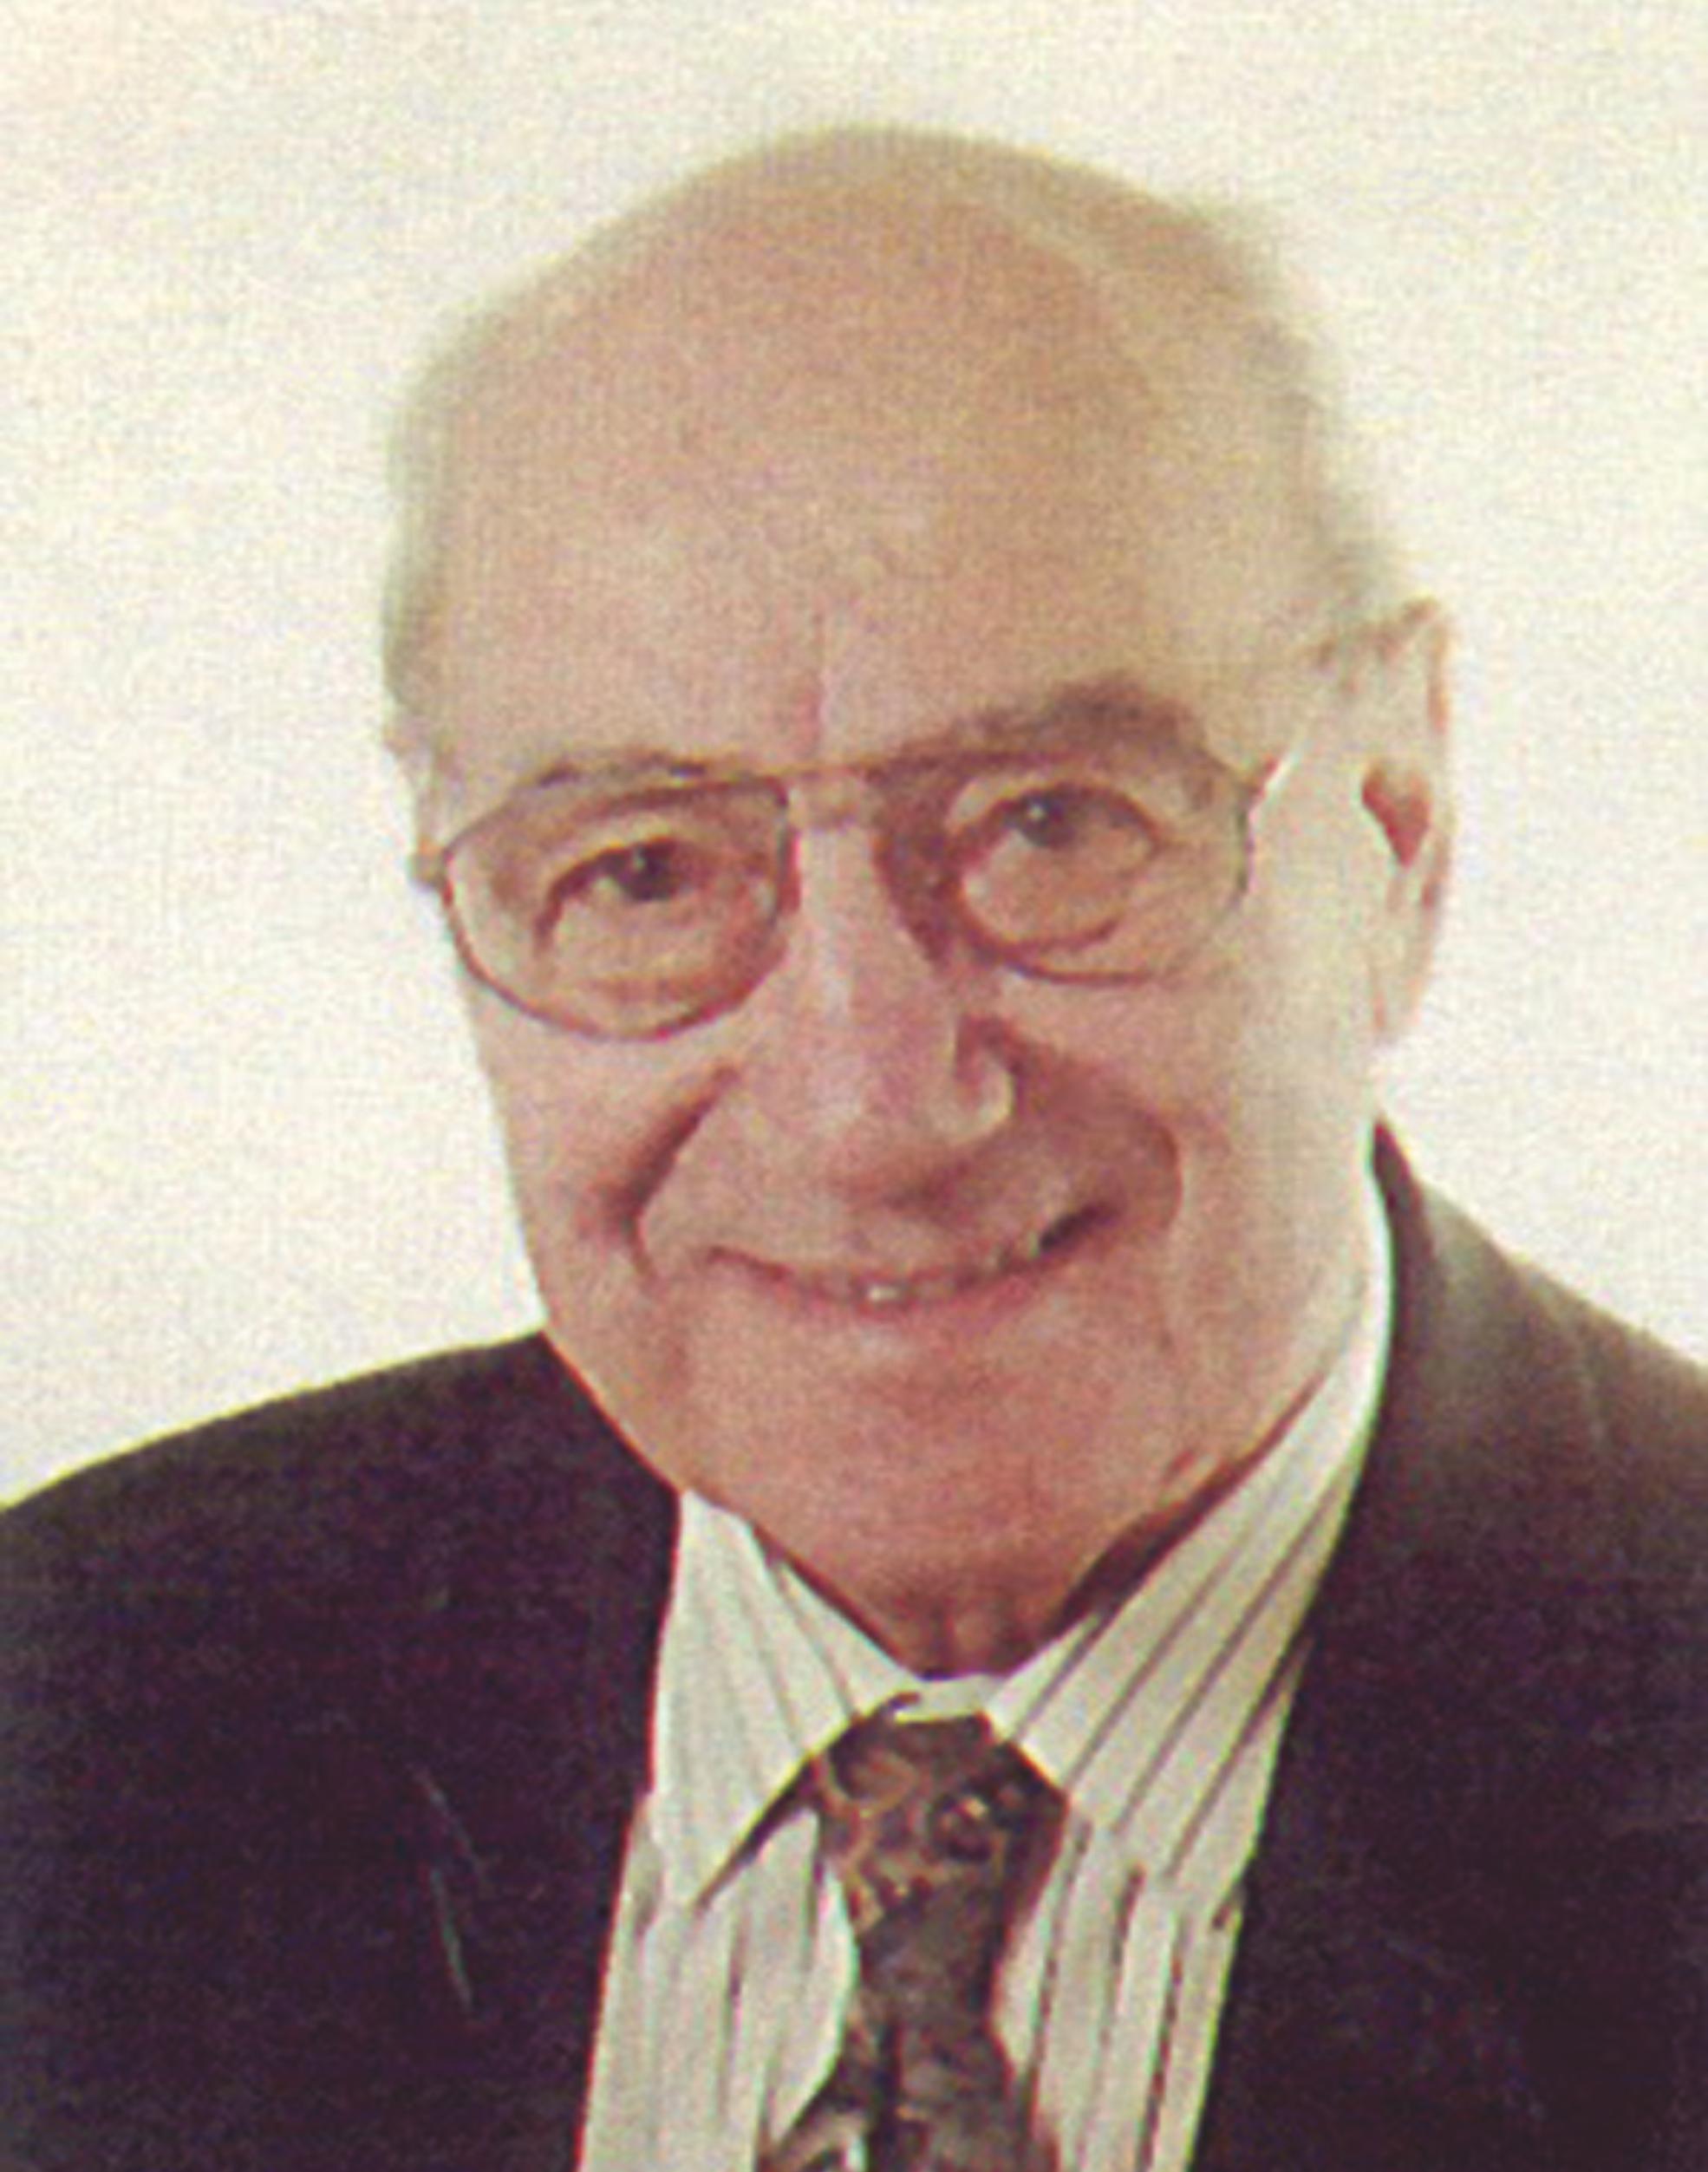 Richard Schmiederer